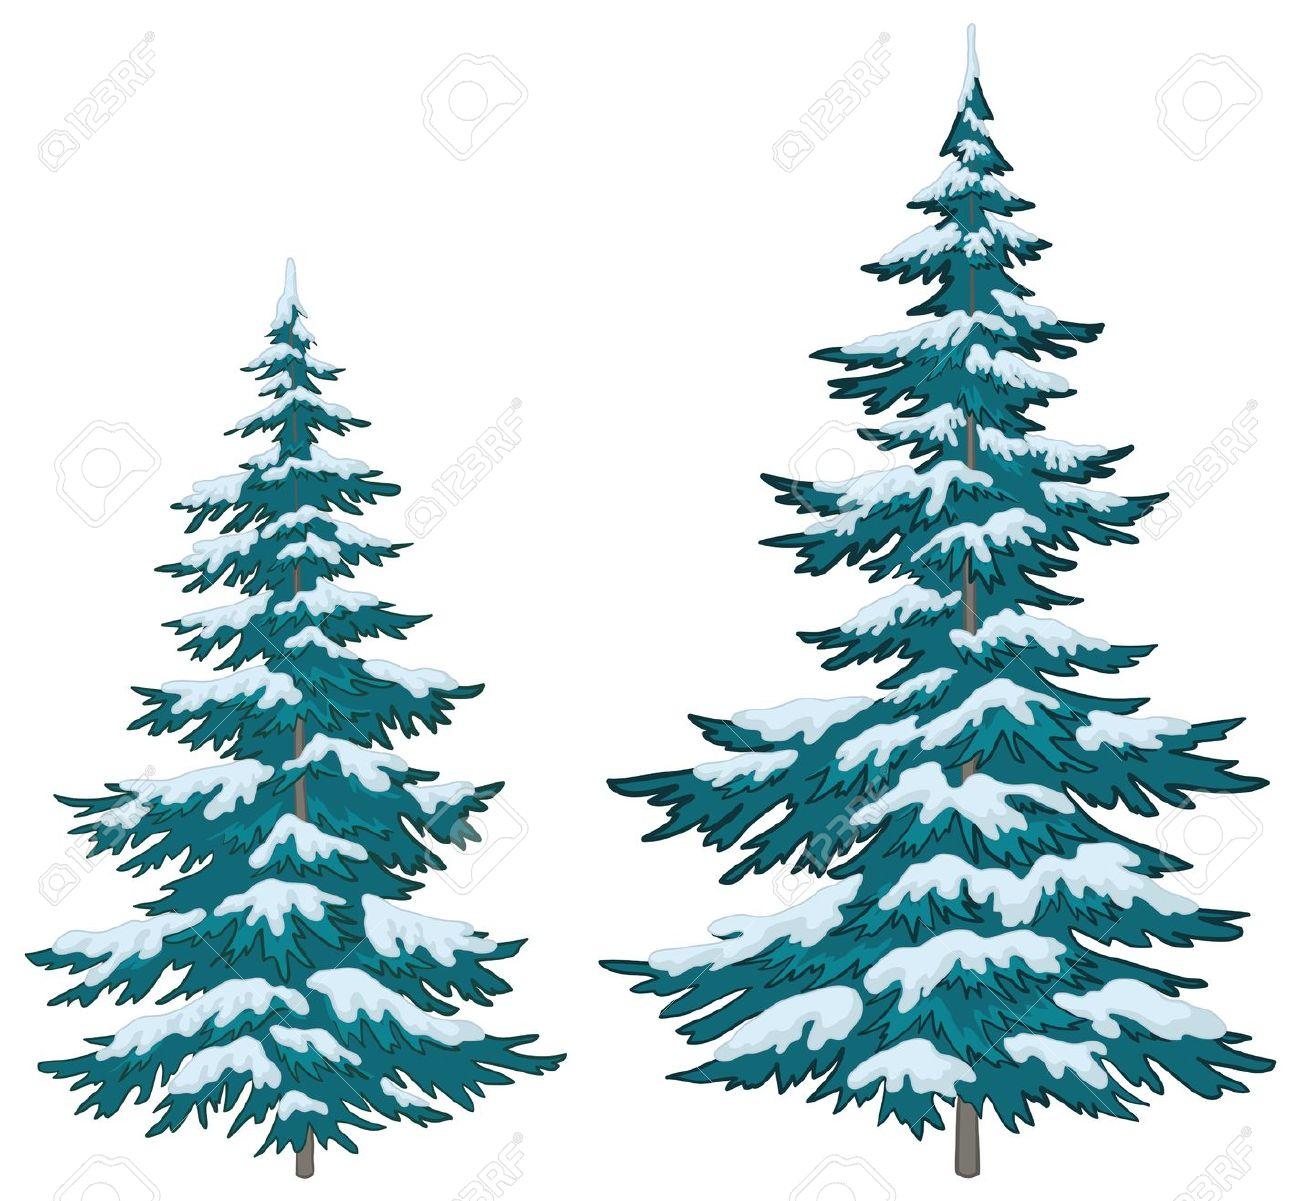 1300x1201 Pine Cone Clip Art Silhouette. Free Pictures Free Clip Arts